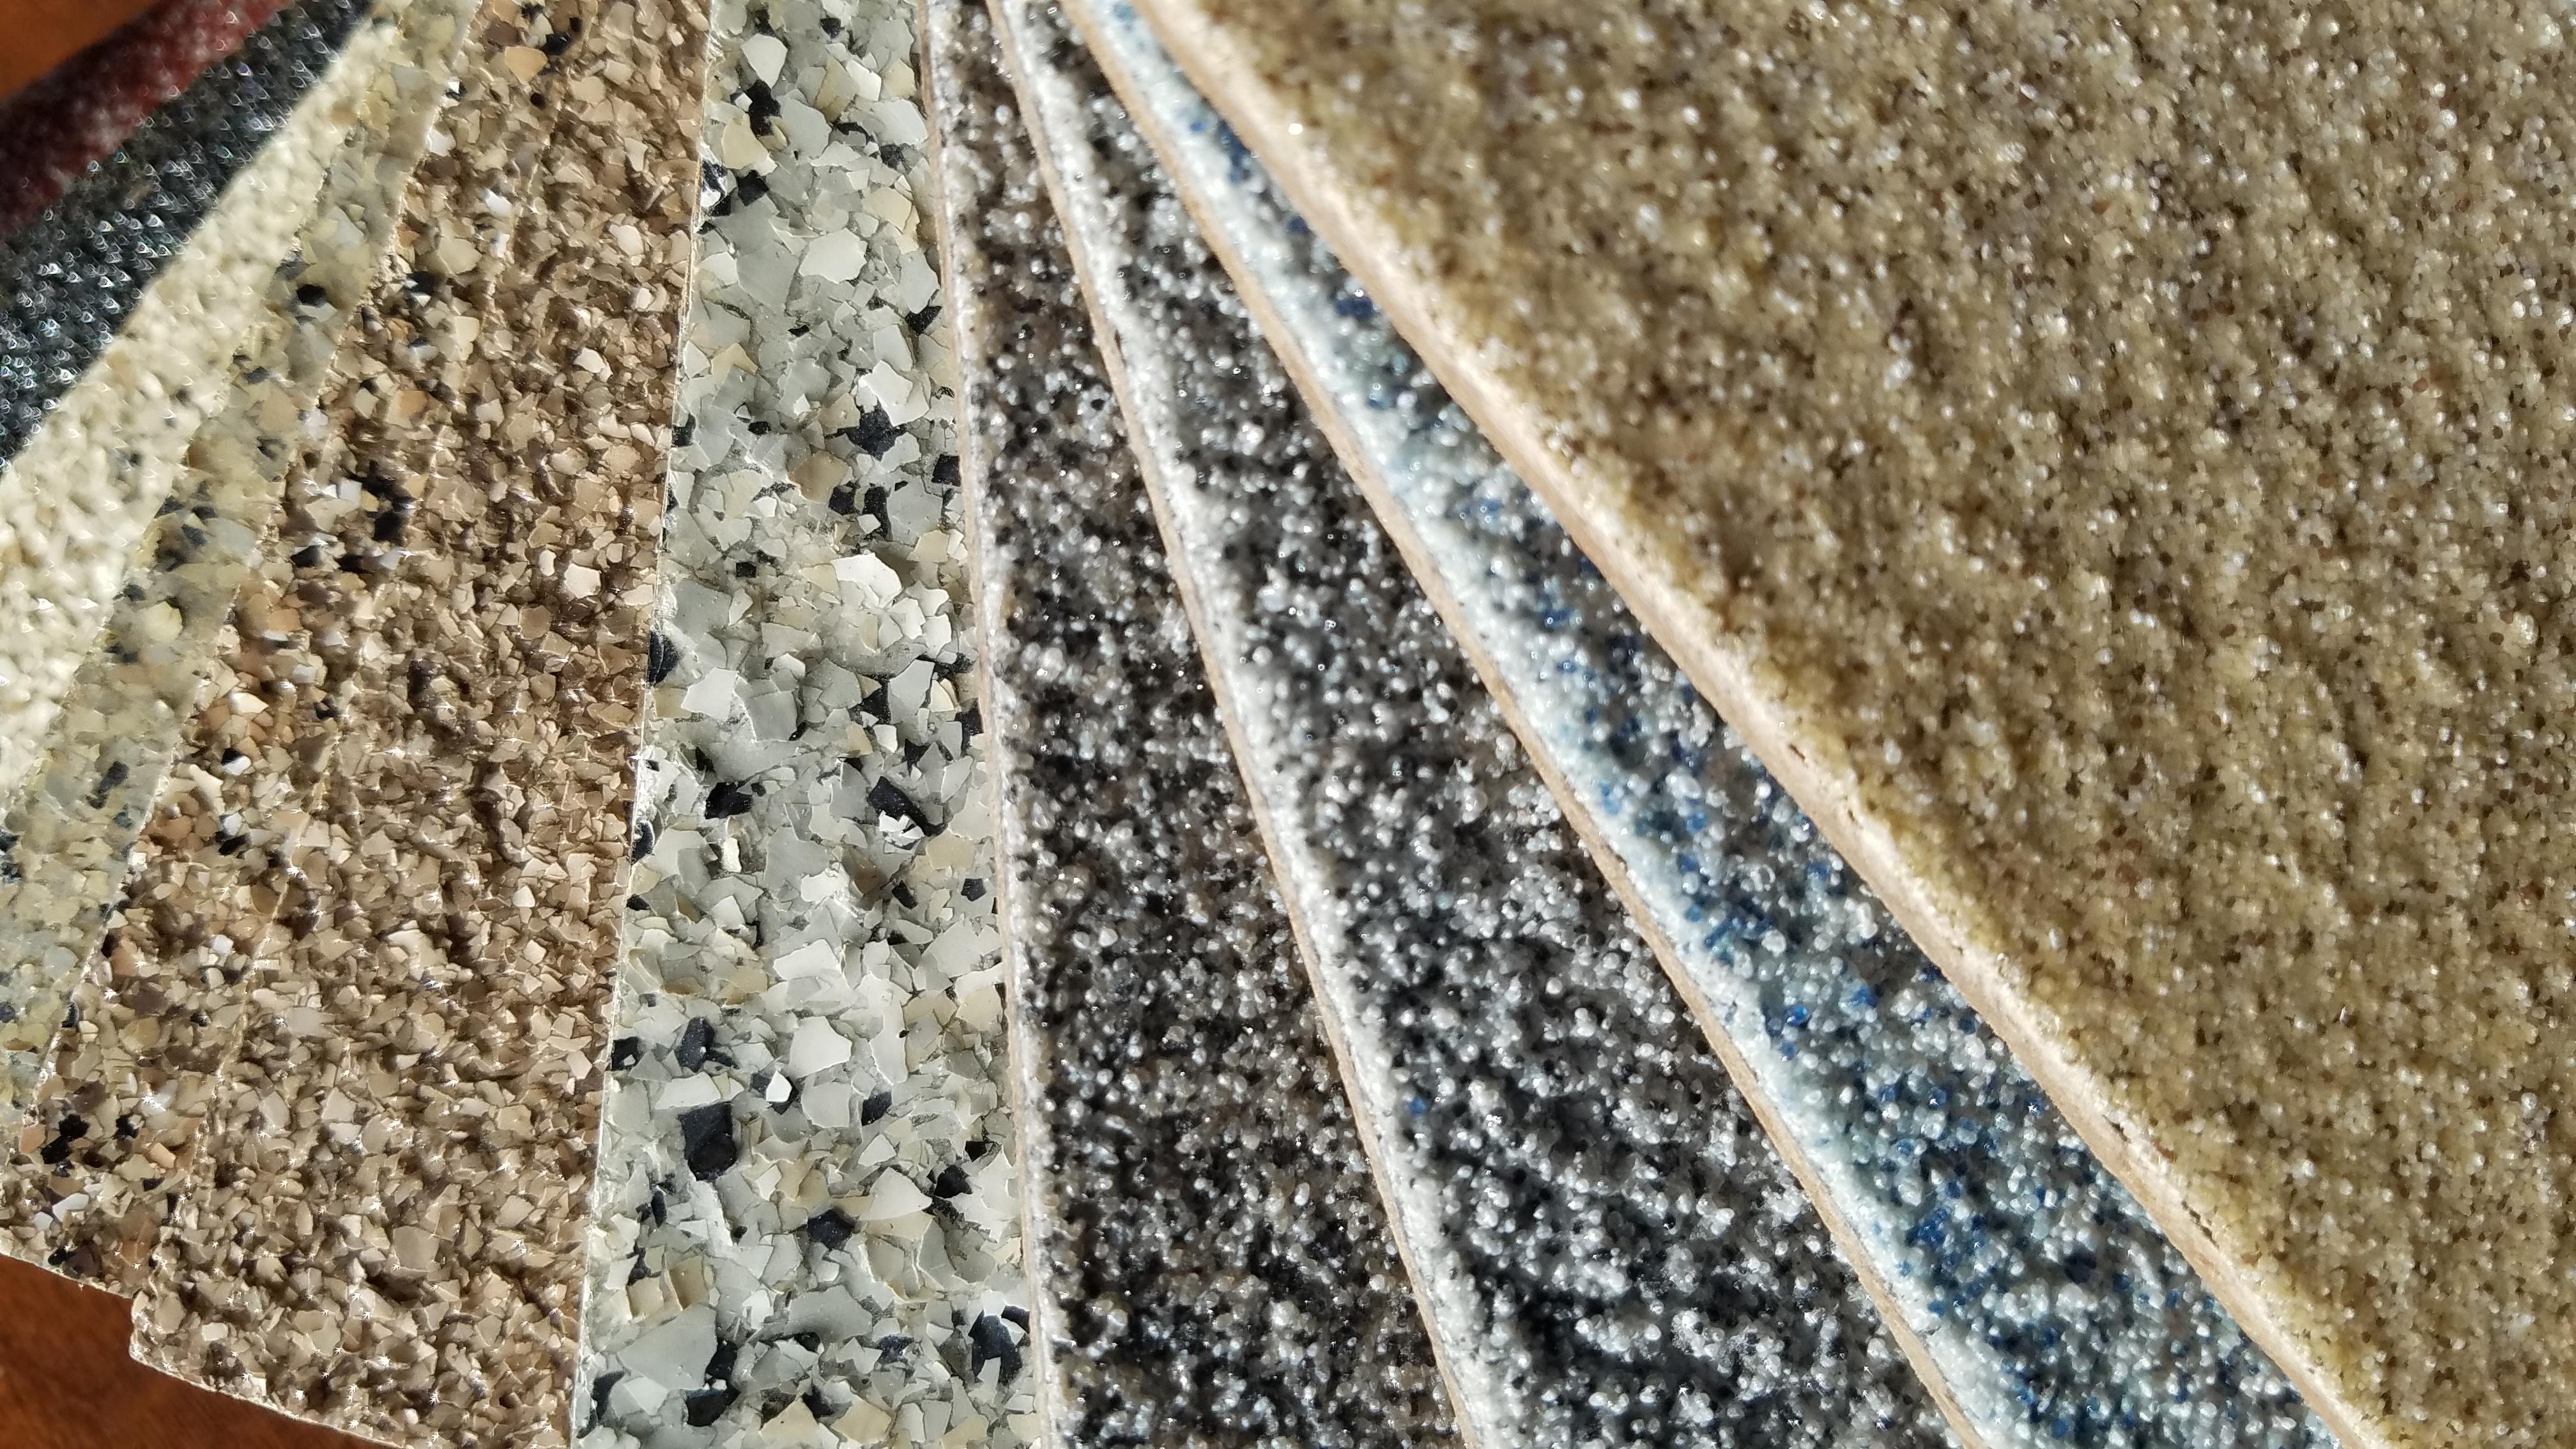 Epoxy Floor Coating Close-up View